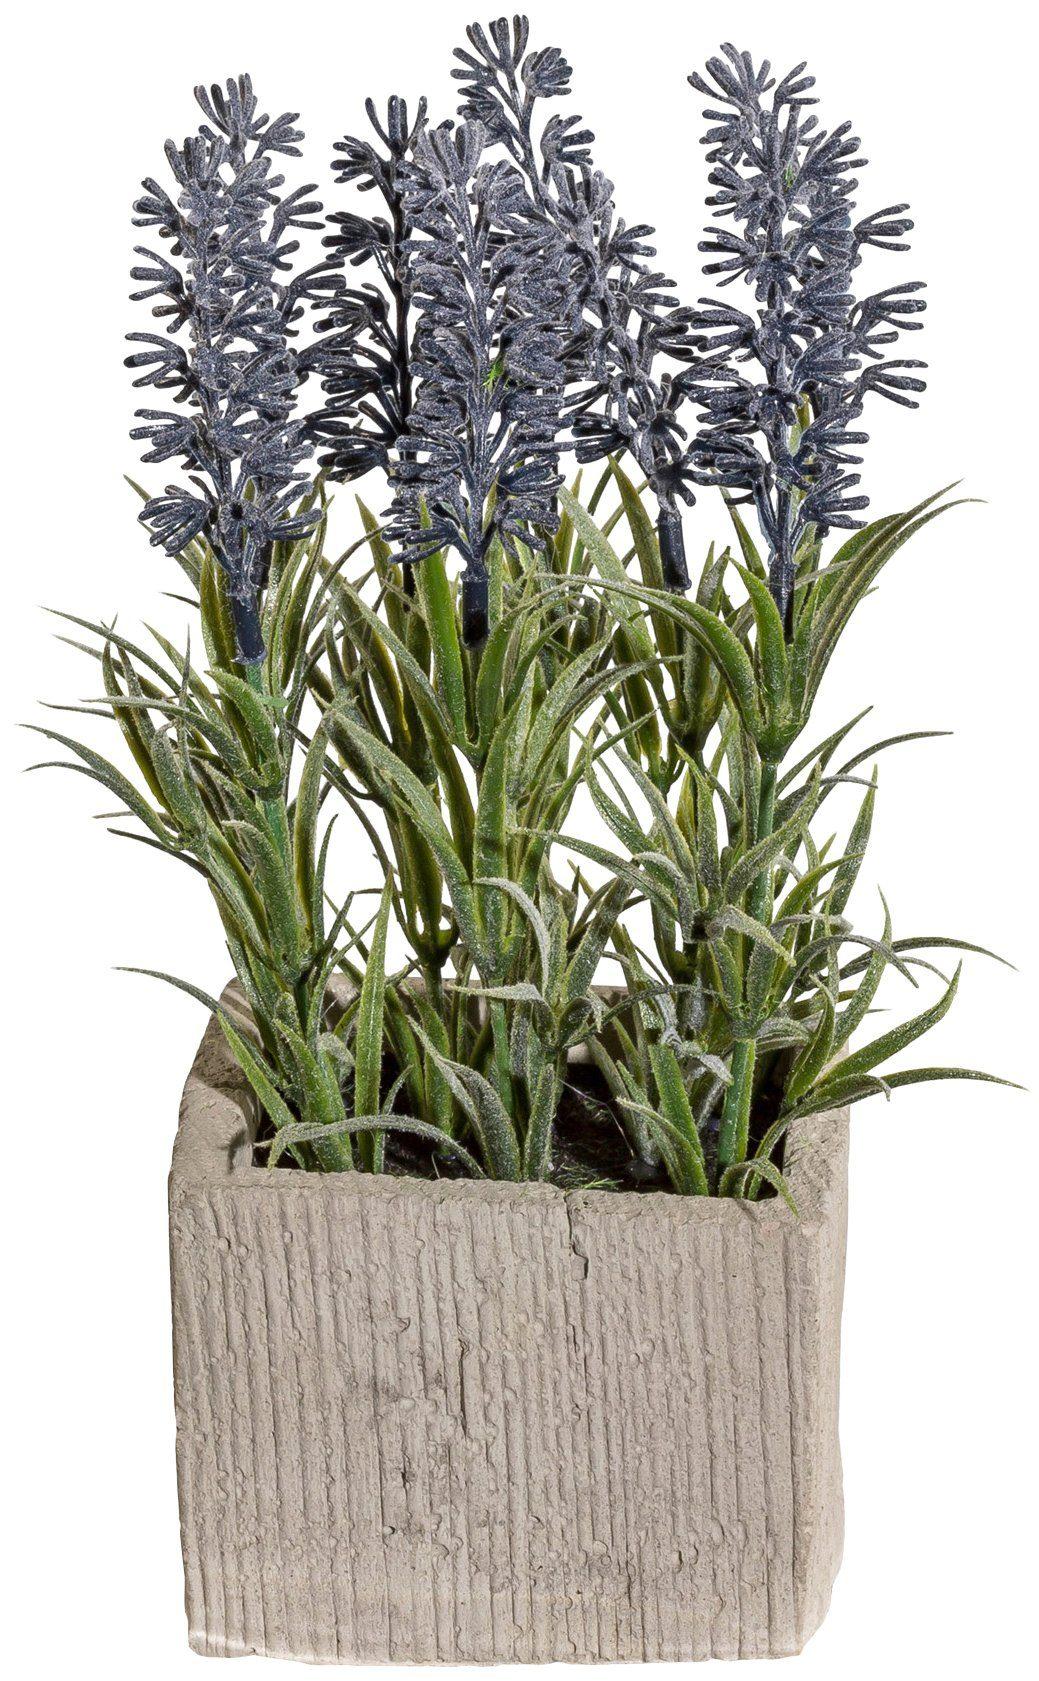 Kunstpflanze »Lavendelbusch«, im Zementtopf, Höhe 20 cm, lila